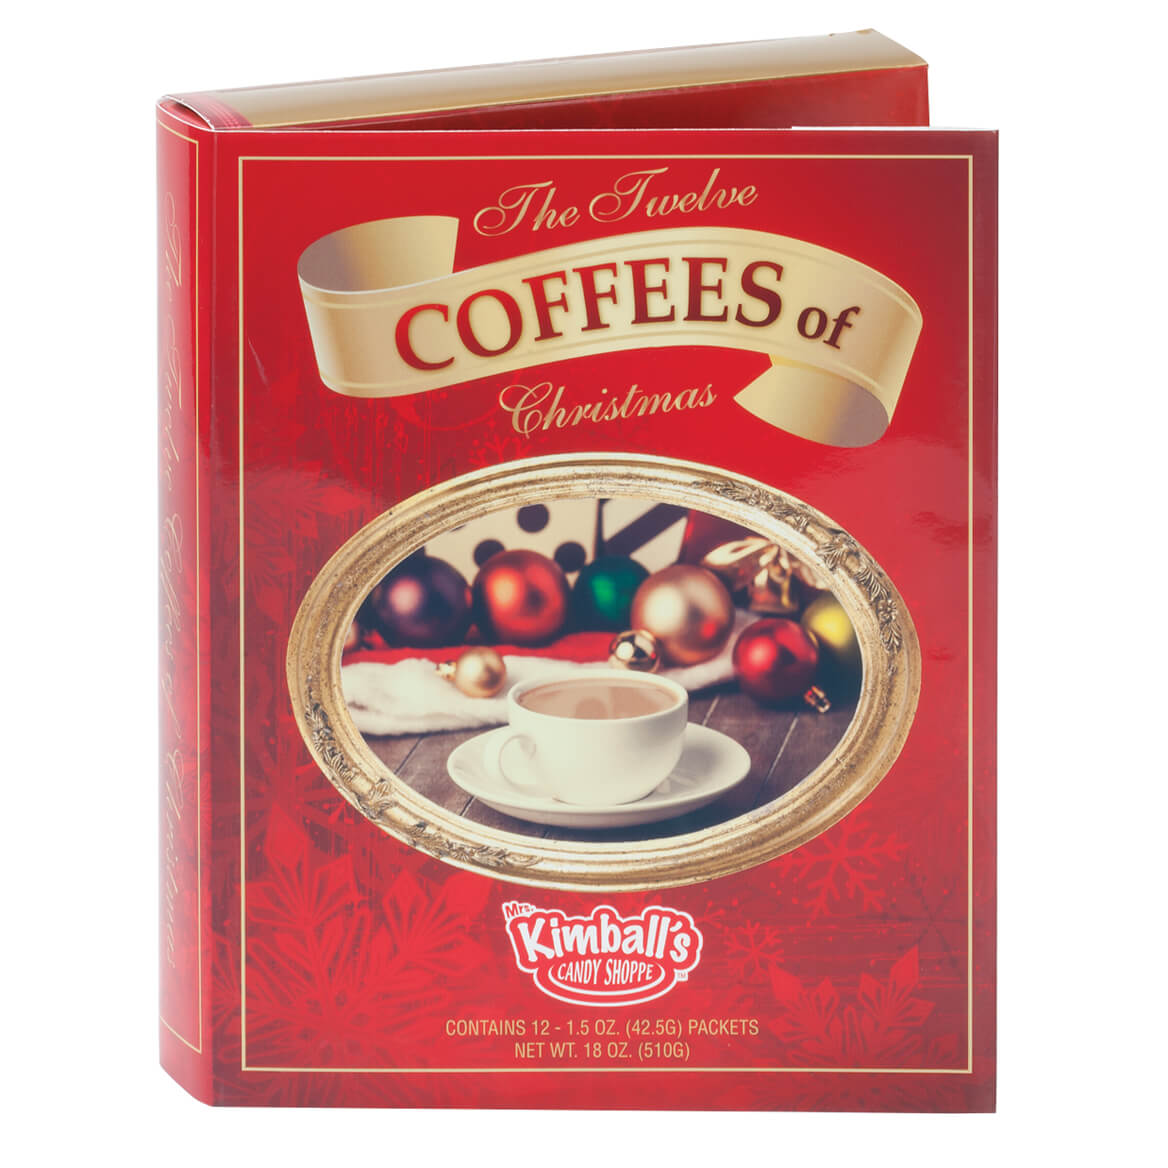 Twelve Coffees of Christmas